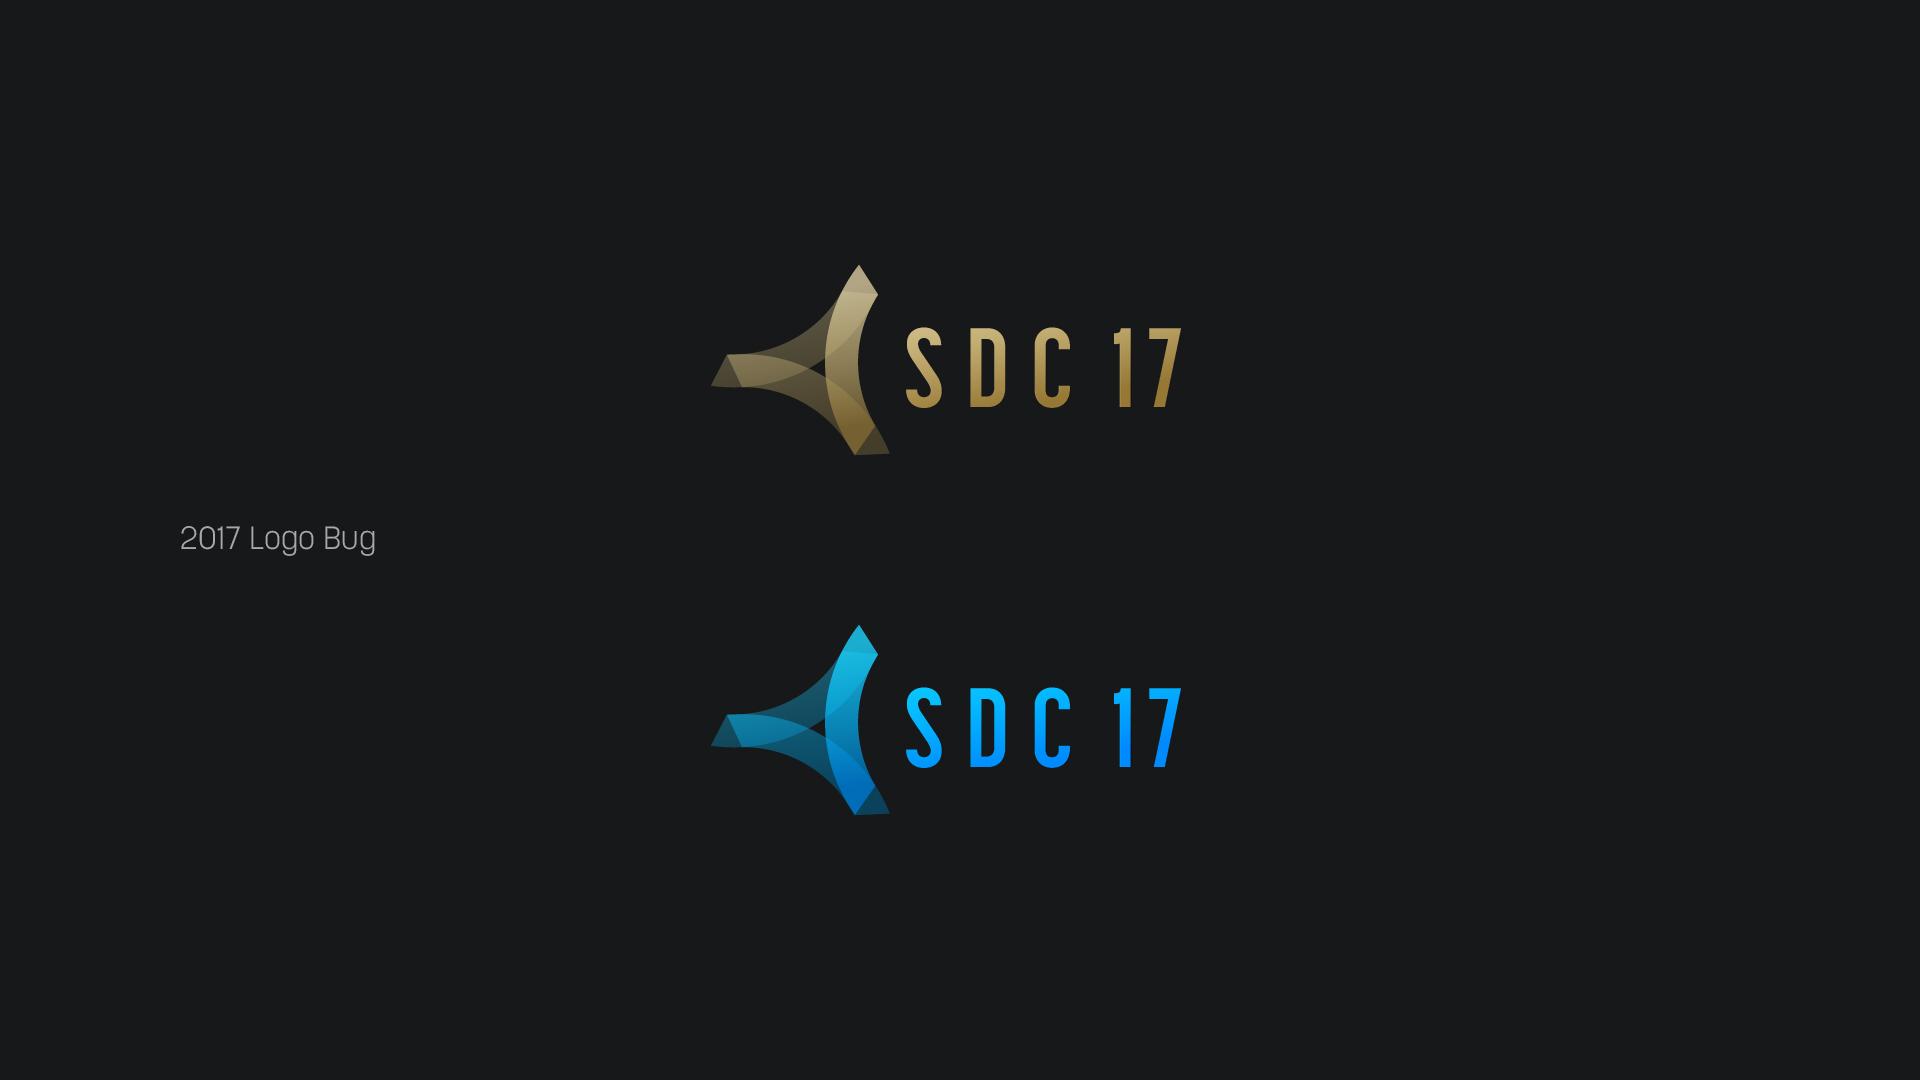 SDC17_Expansion_1_BrandSystem_2.jpg